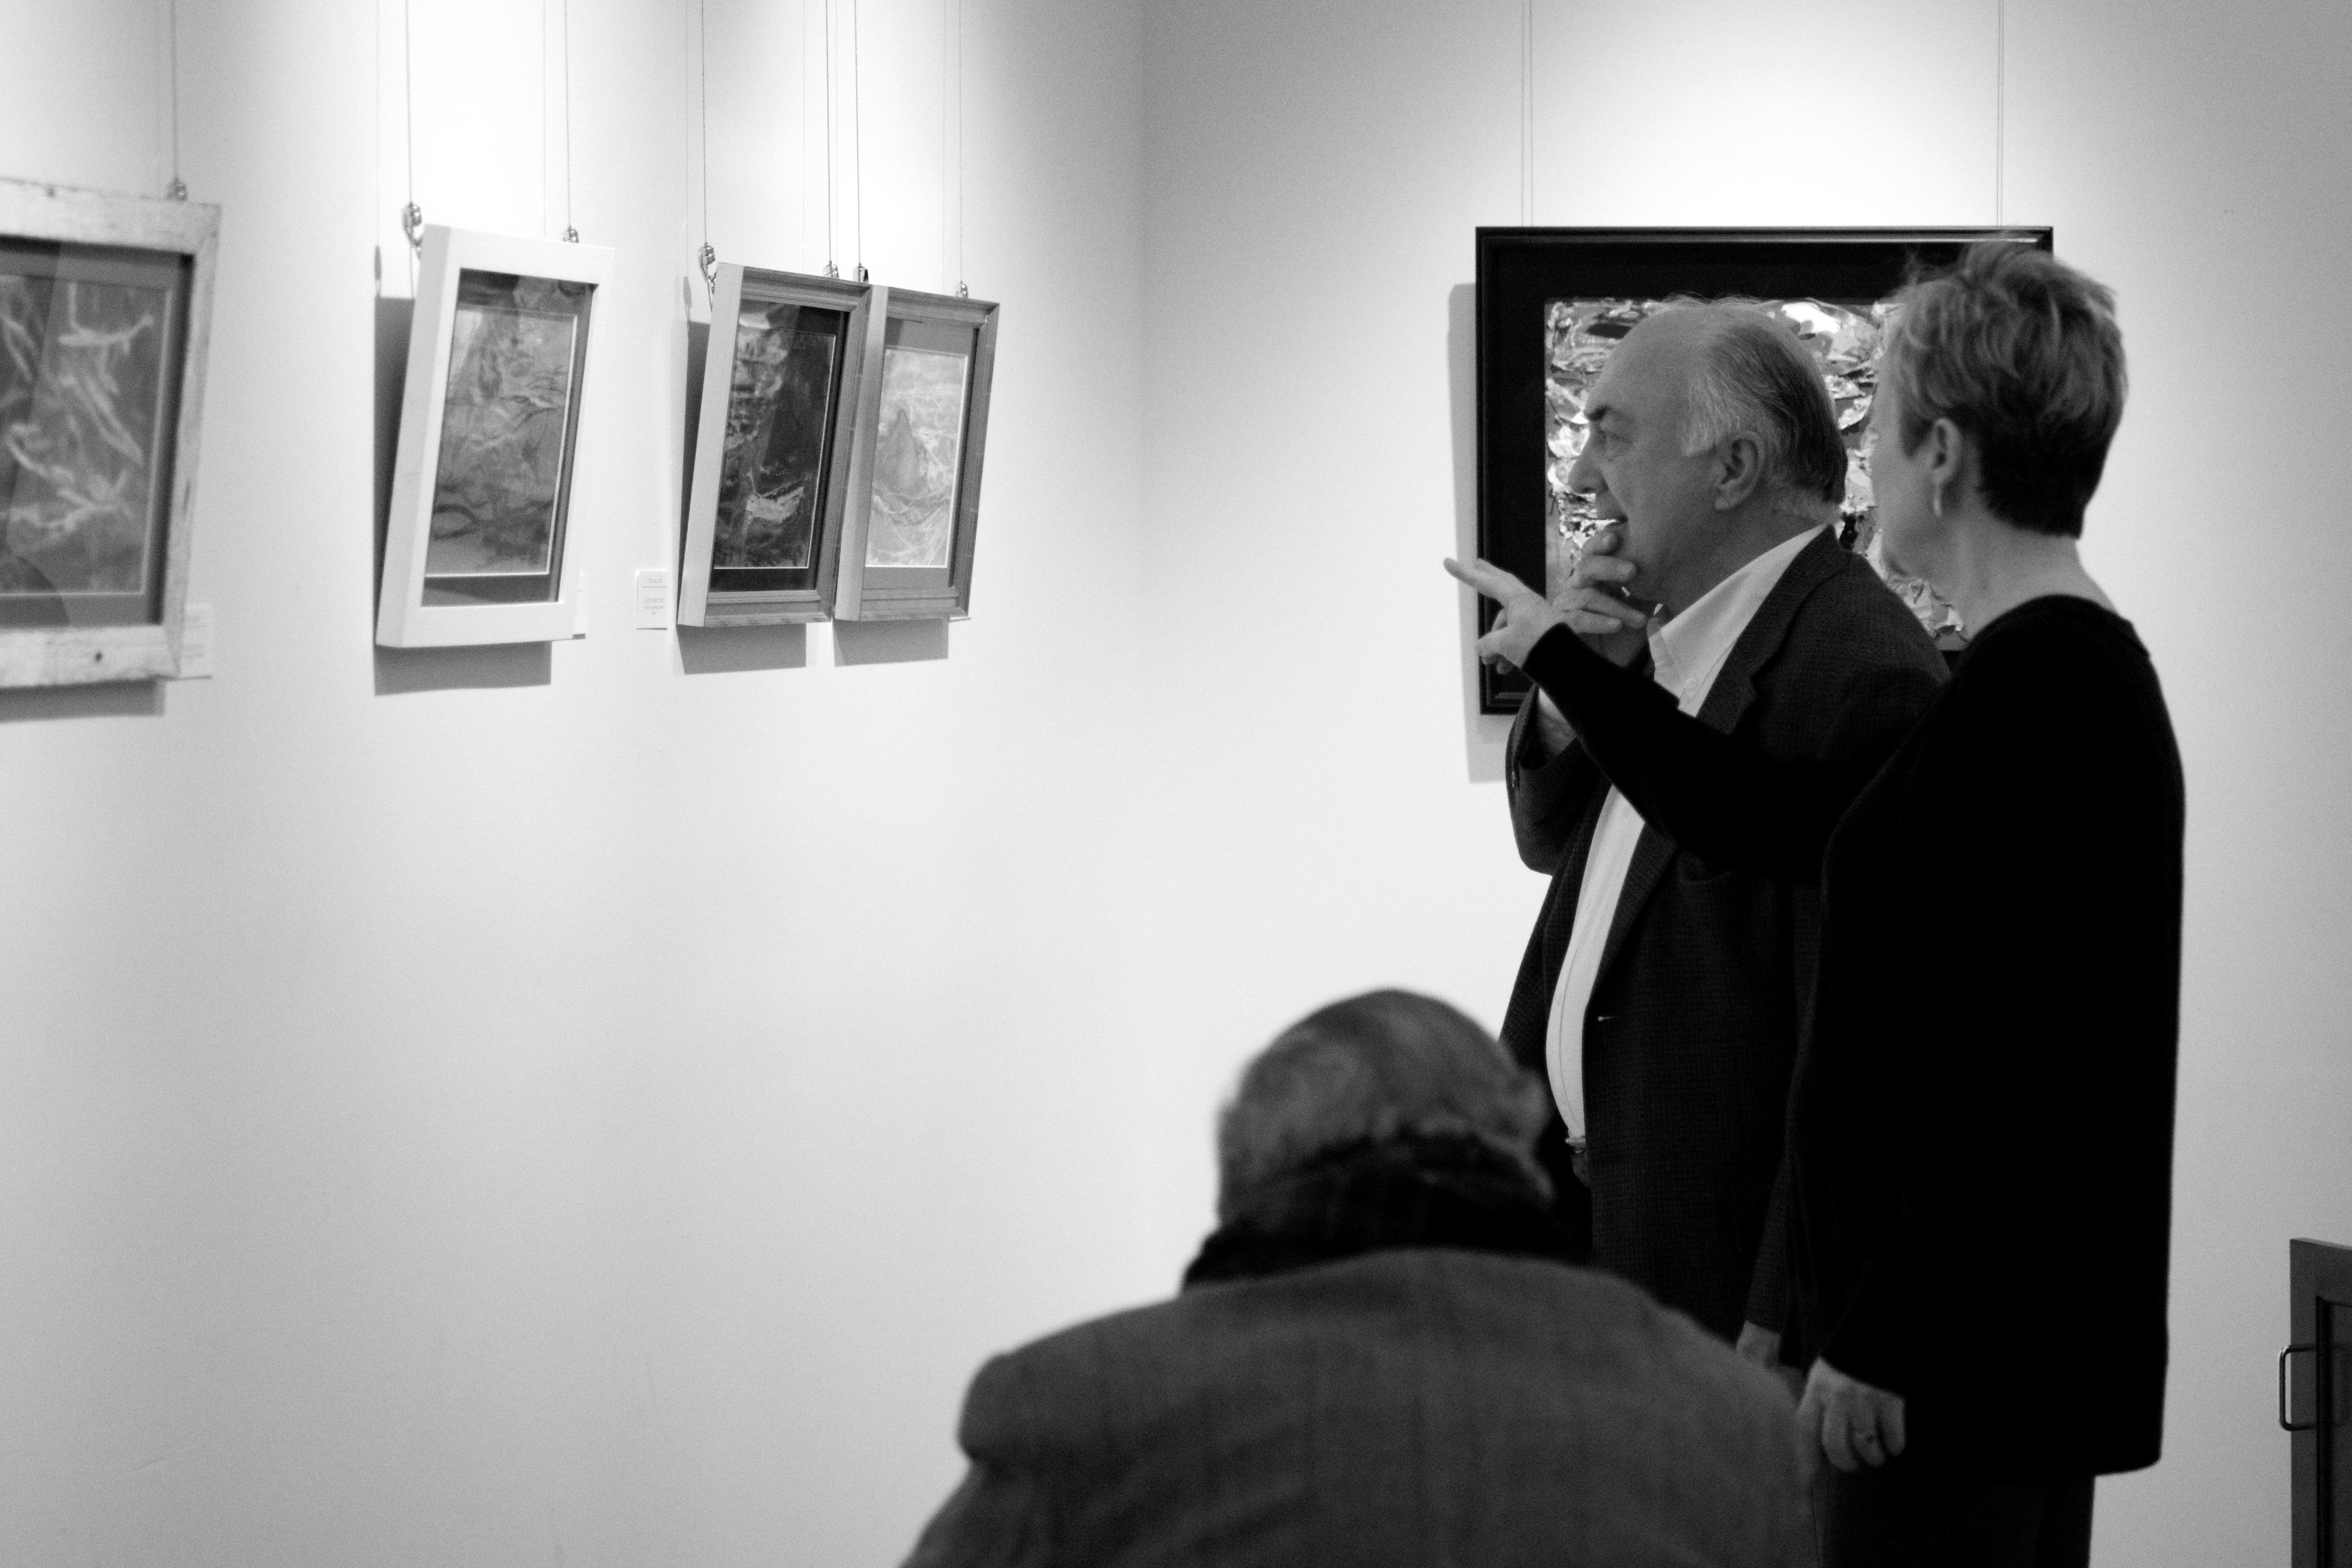 T. Mullins Art Show, March 2018